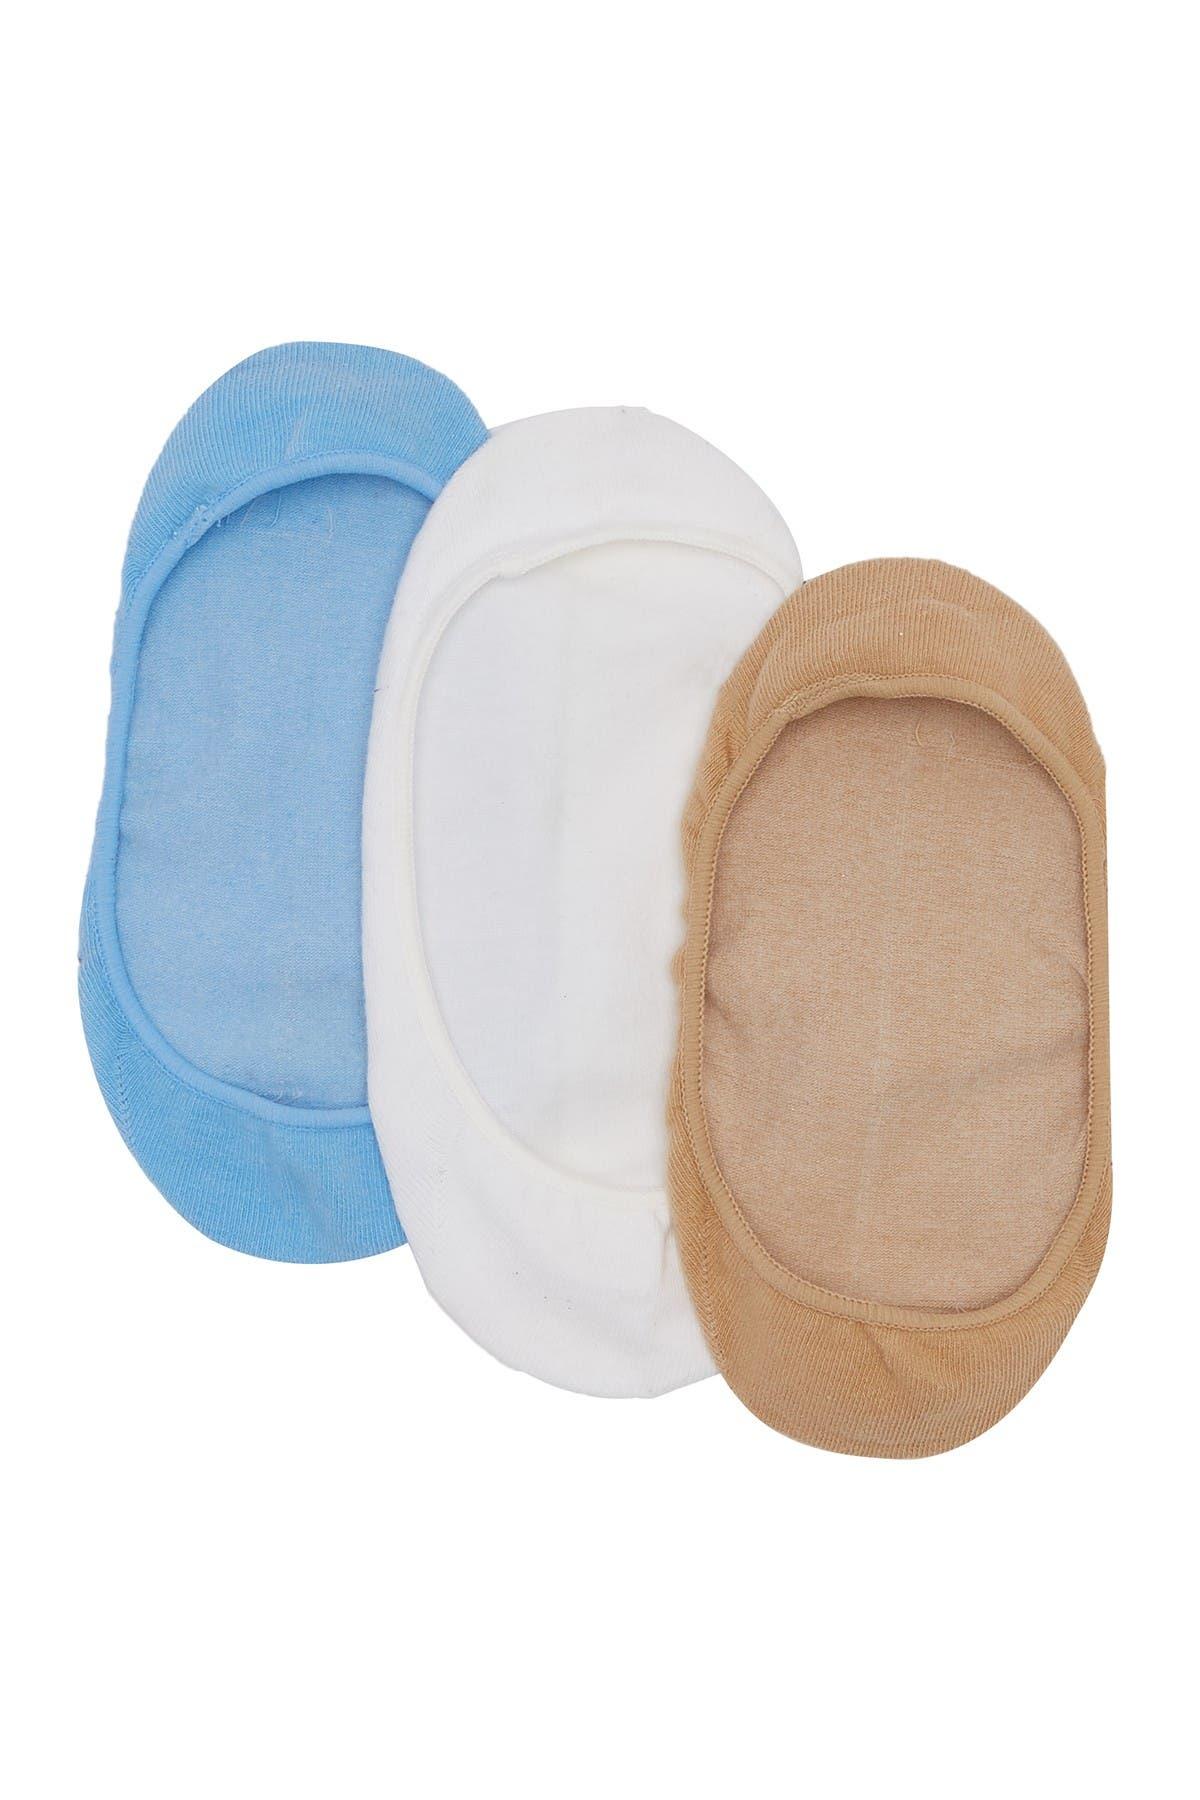 Image of HUE Low Cut Sock Liner - Pack of 3